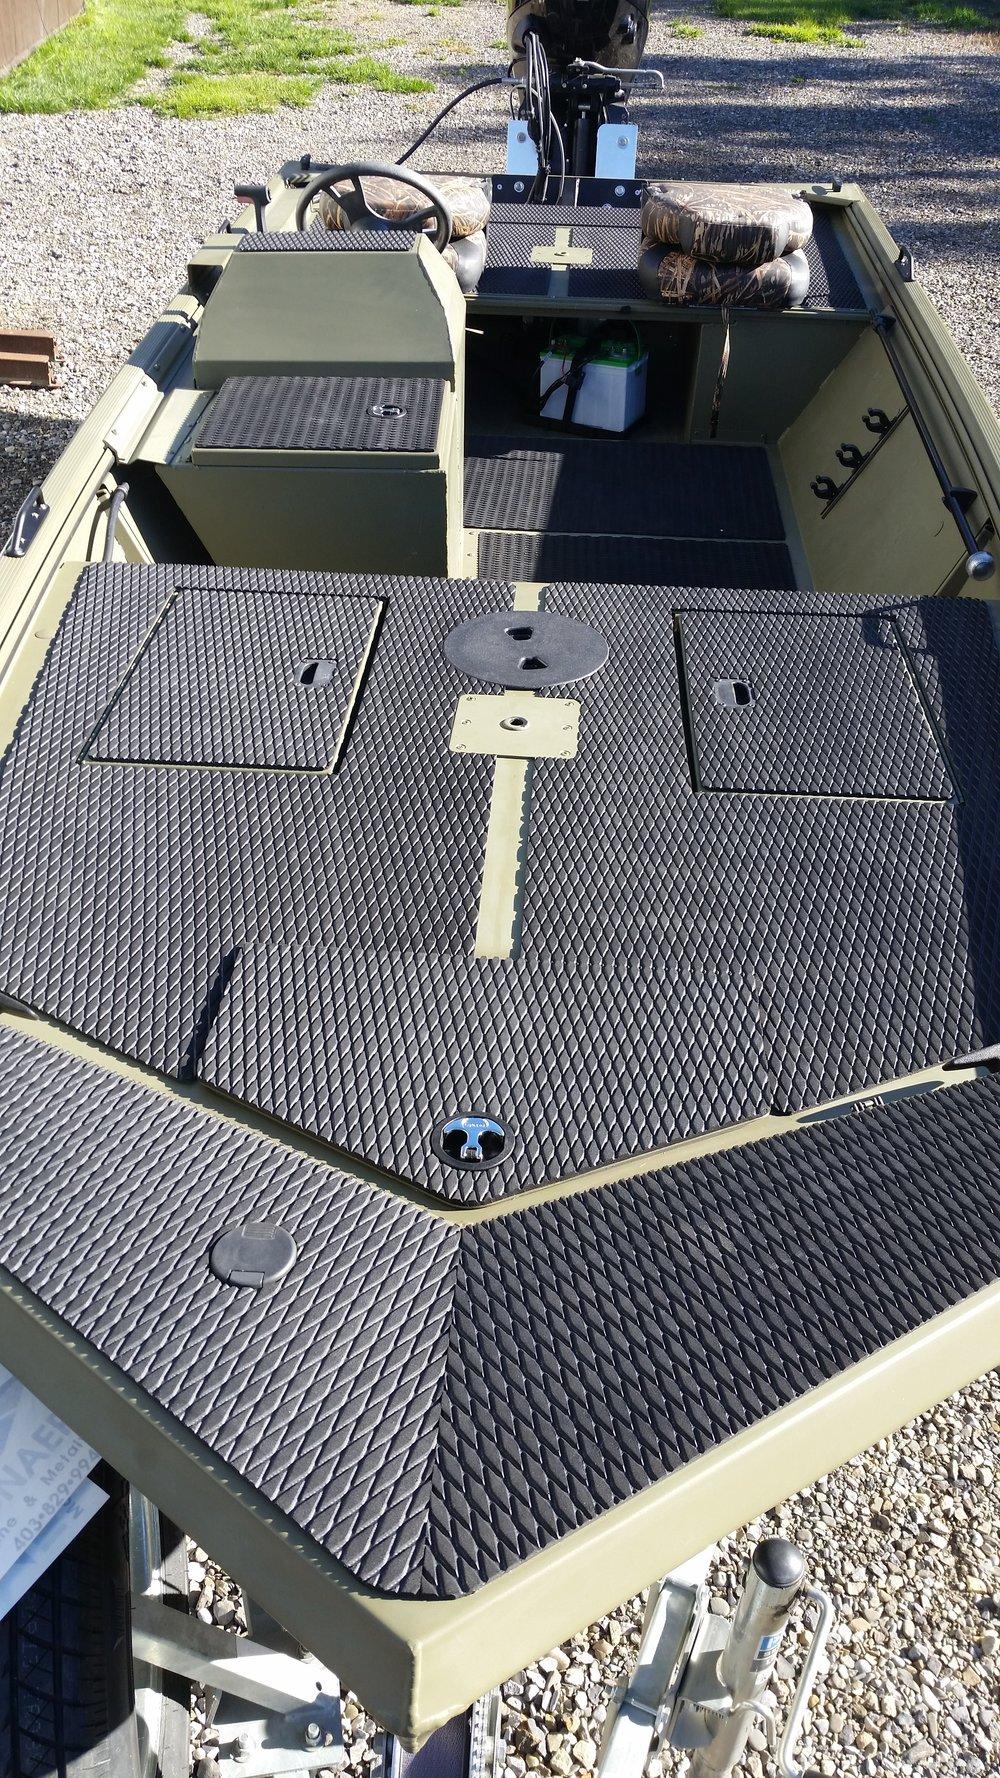 Hydro turf<br>deck/floor material